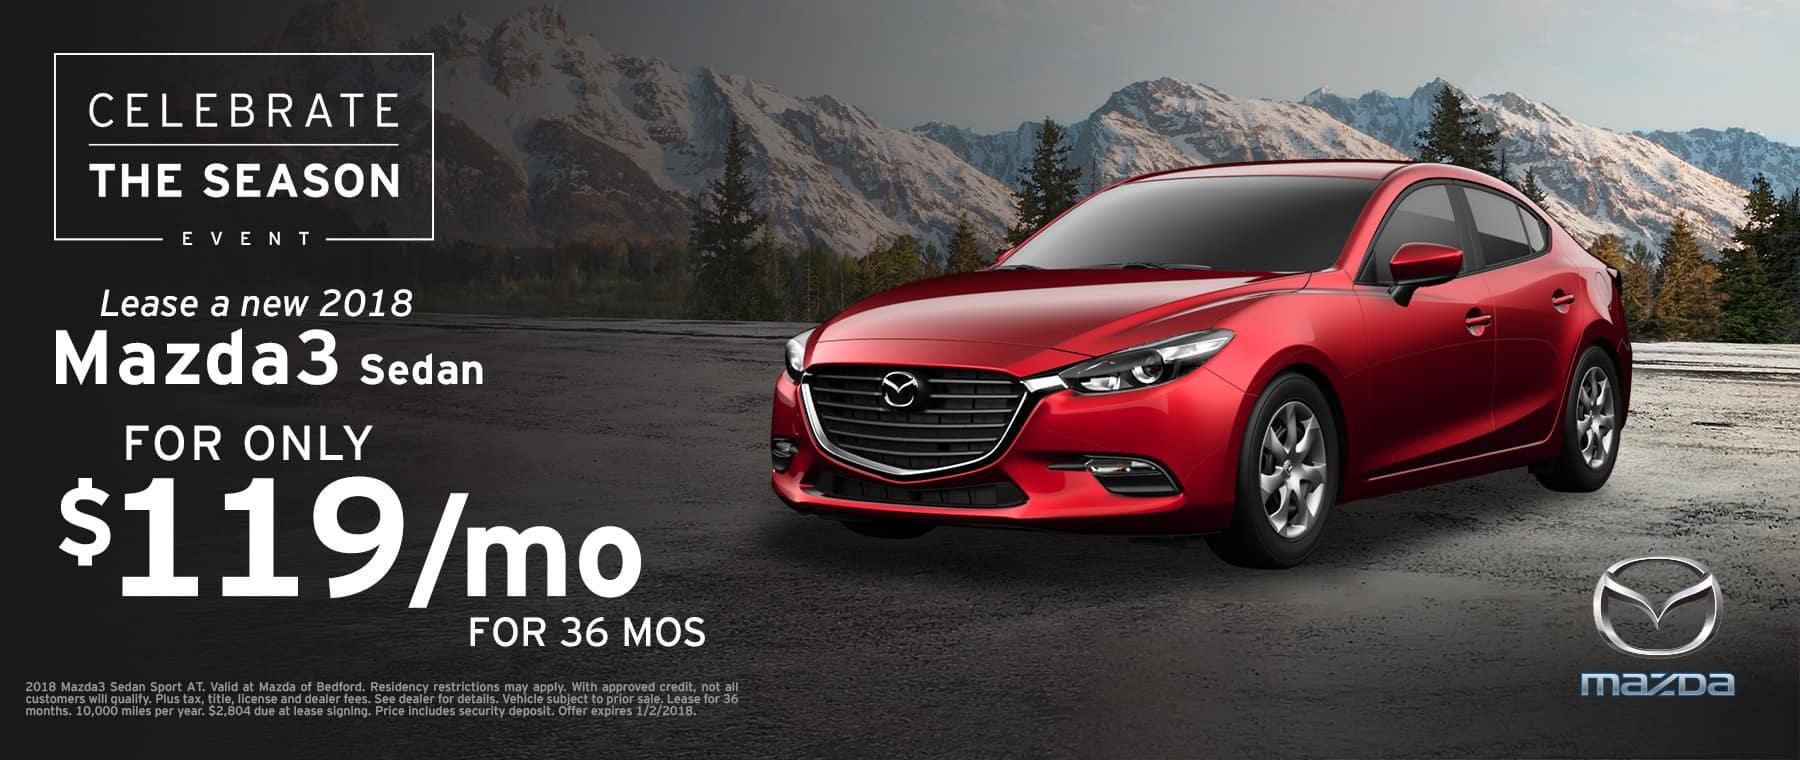 2018 Mazda3 Lease Offer